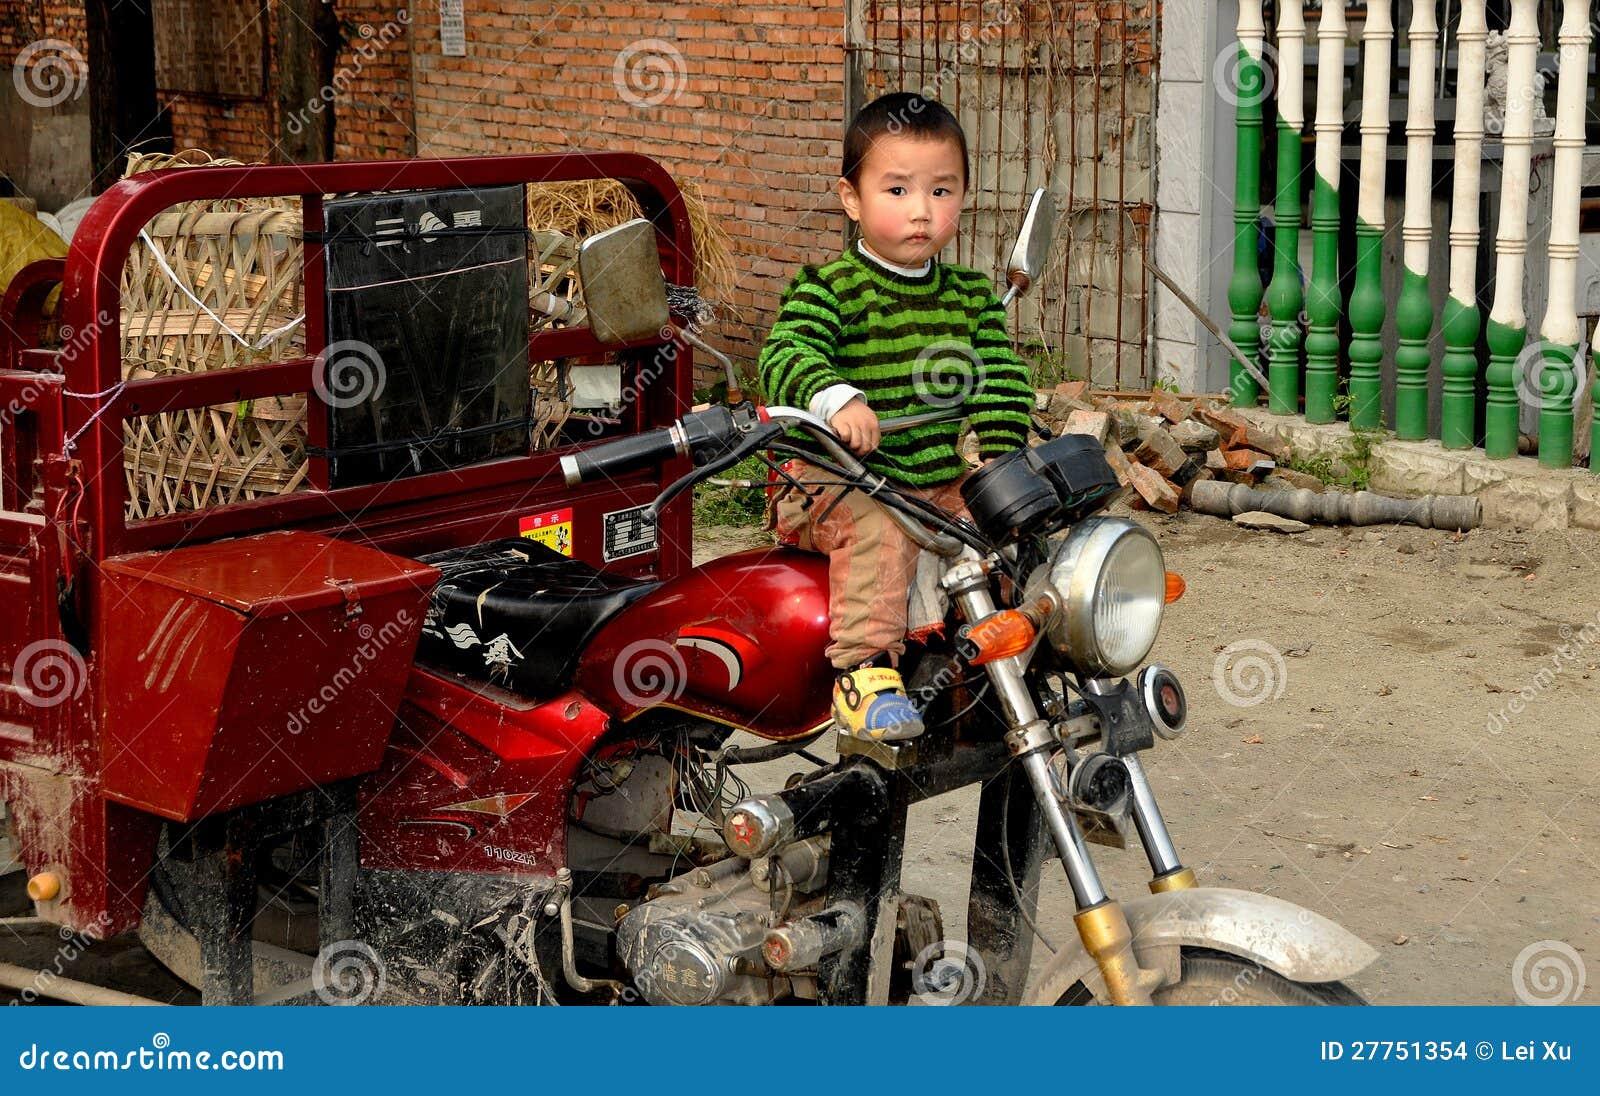 little boy on motorcycle - photo #34